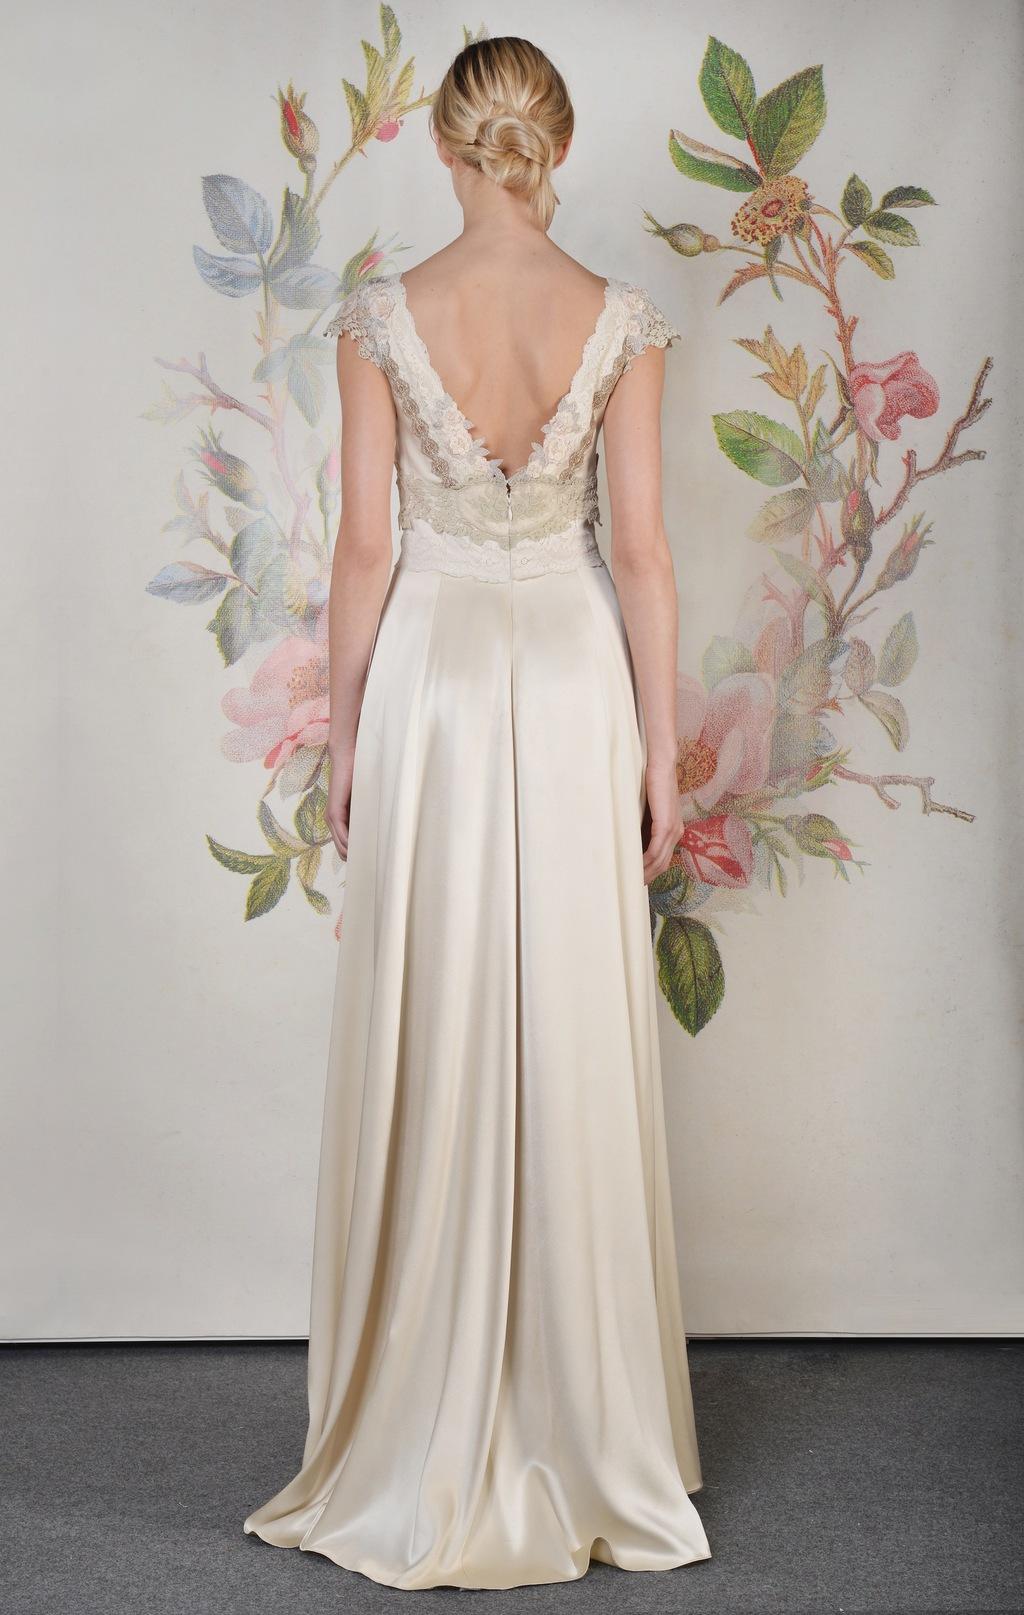 Claire-pettibone-spring-summer-2014-wedding-dress-abigail_b_01.full